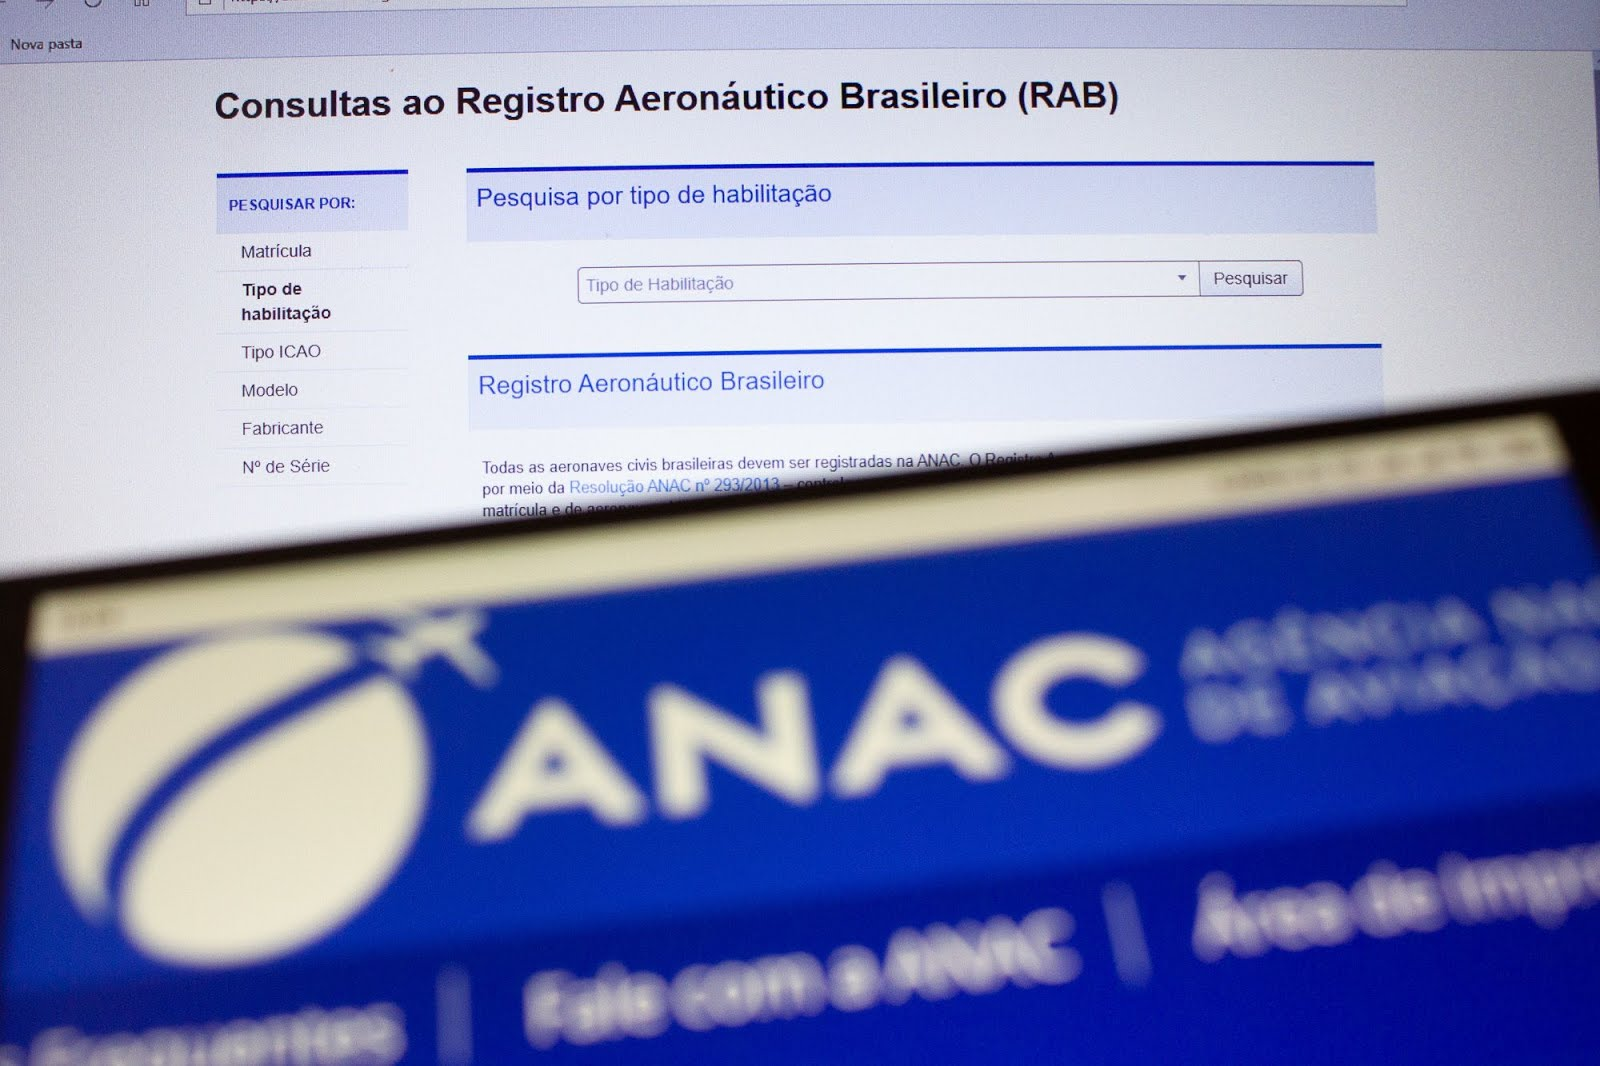 Consultas ao Registro Aeronáutico Brasileiro (RAB)